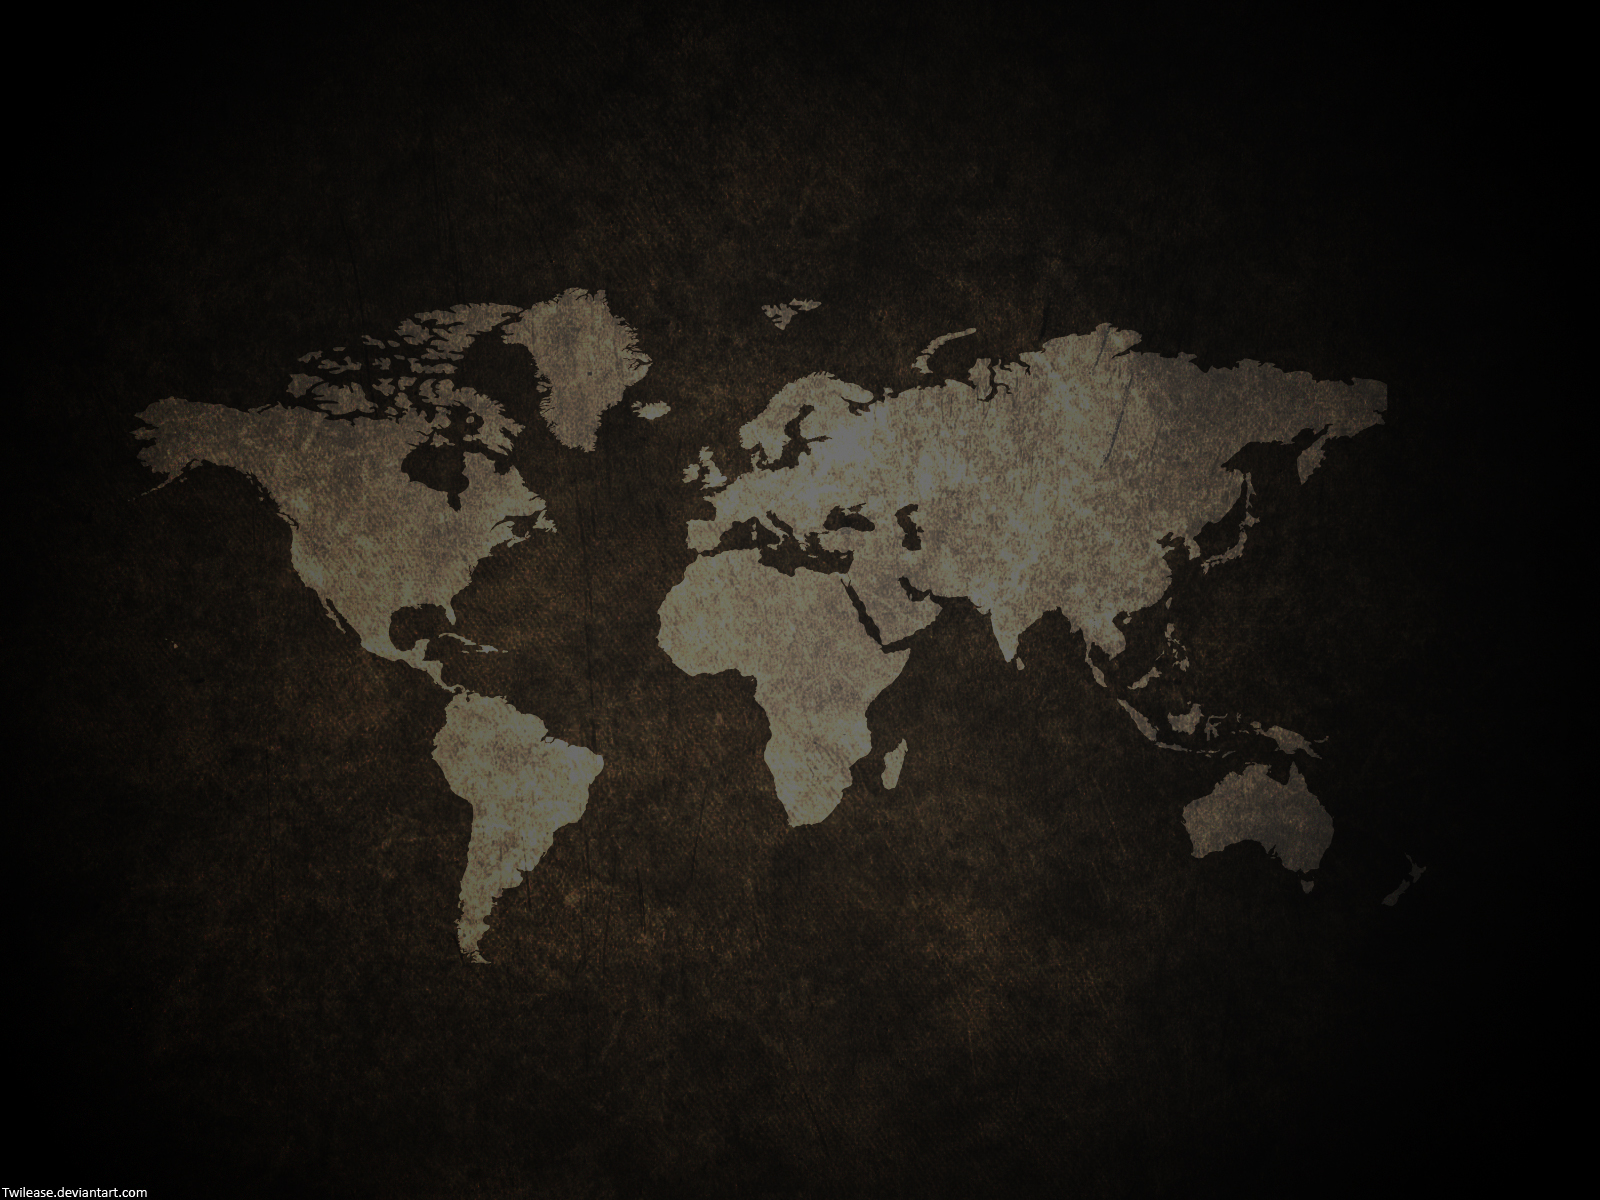 Map Wallpaper old world map desktop wallpaper - wallpapersafari